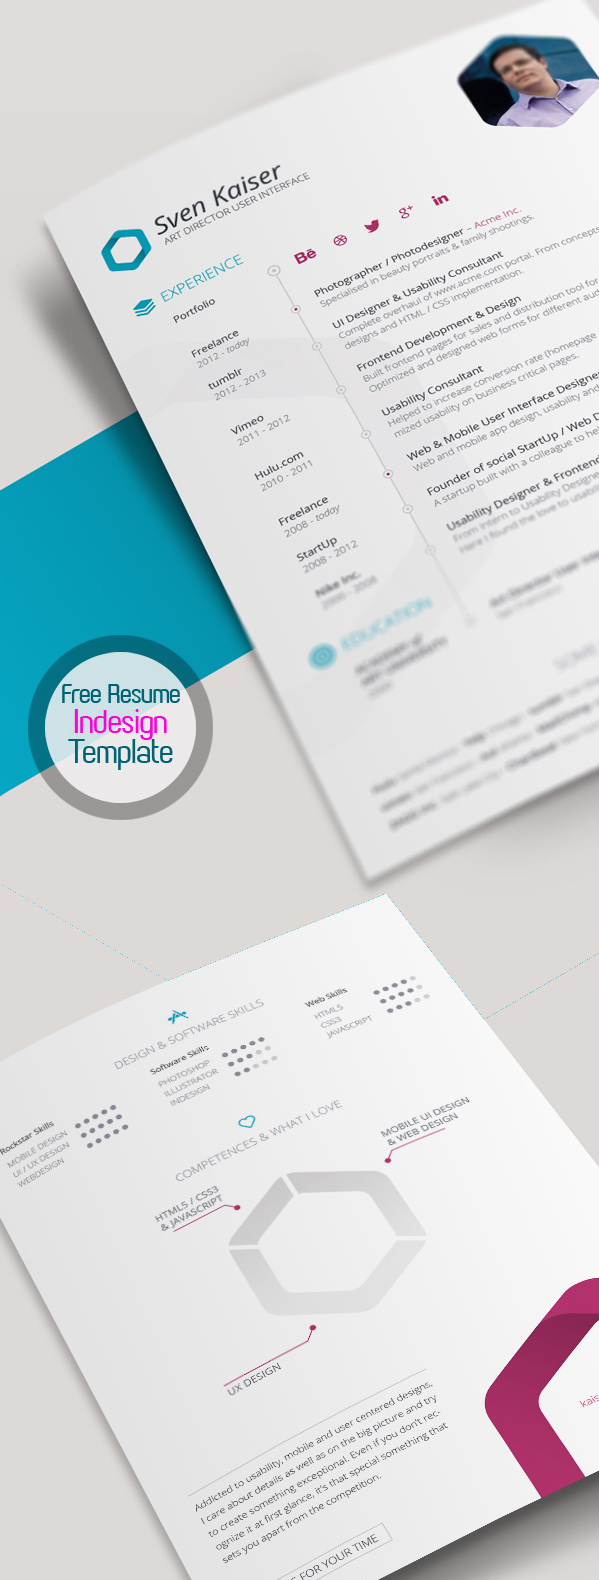 Free Resume Template for InDesign (Vita / CV)